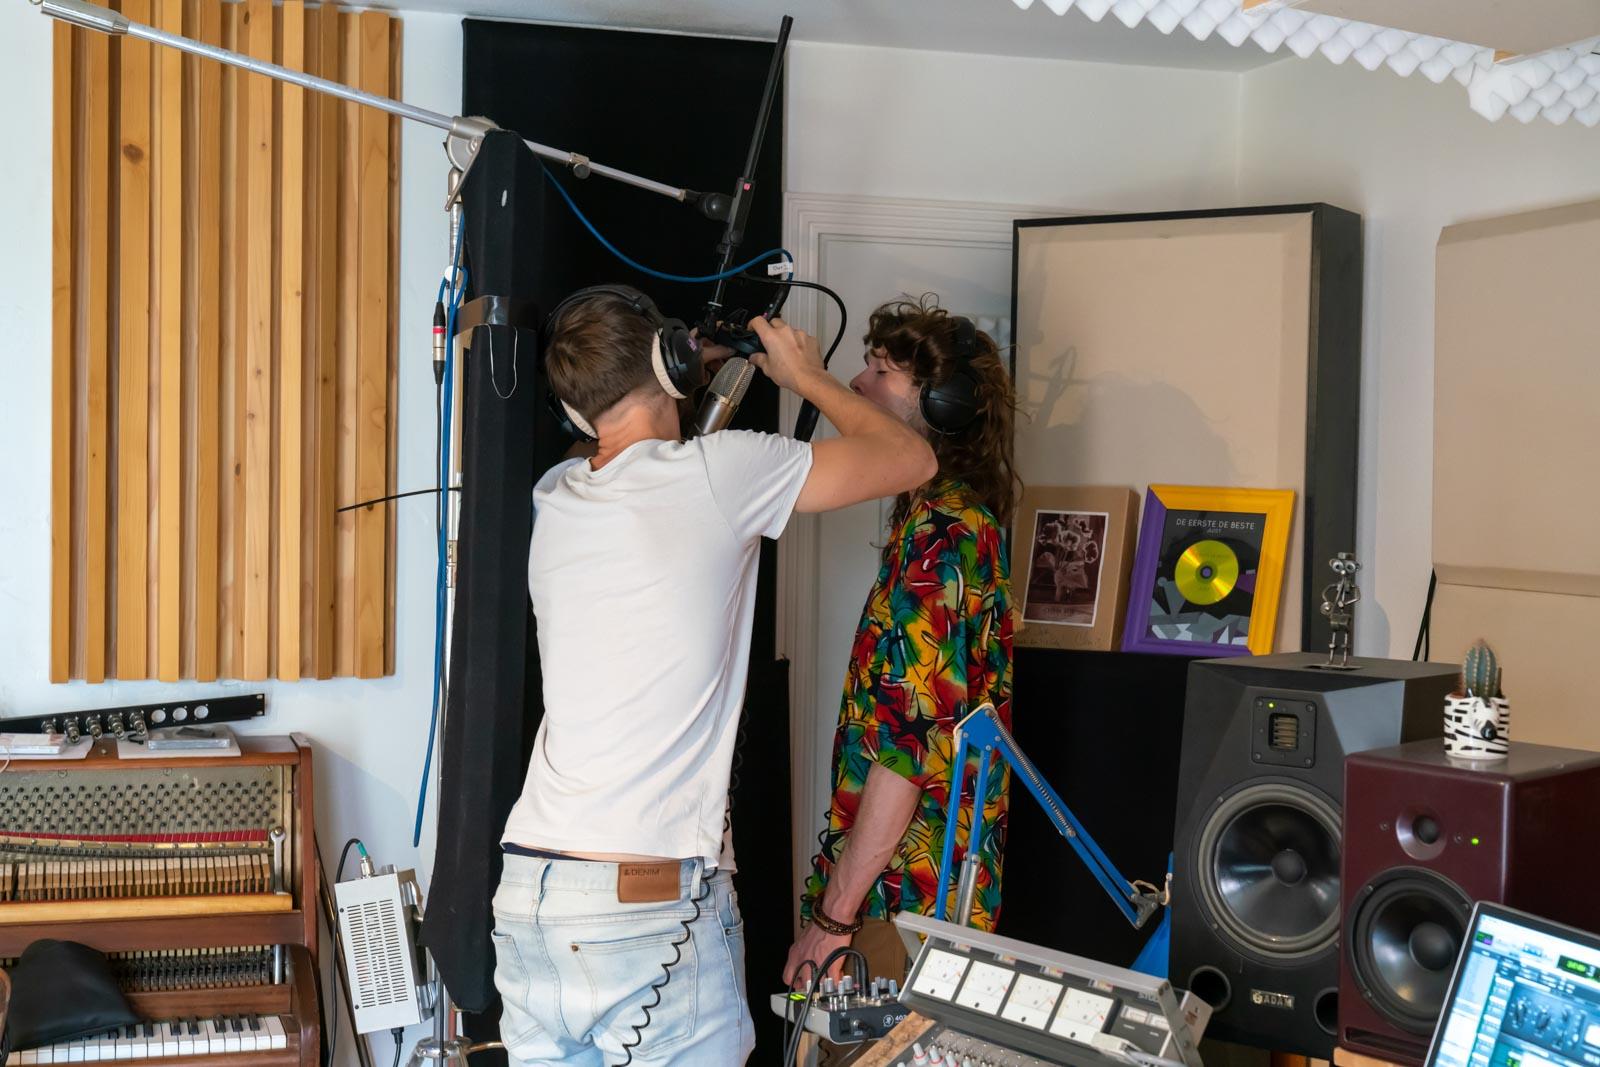 PsySo recording at JJJ Sielcken Amersfoort